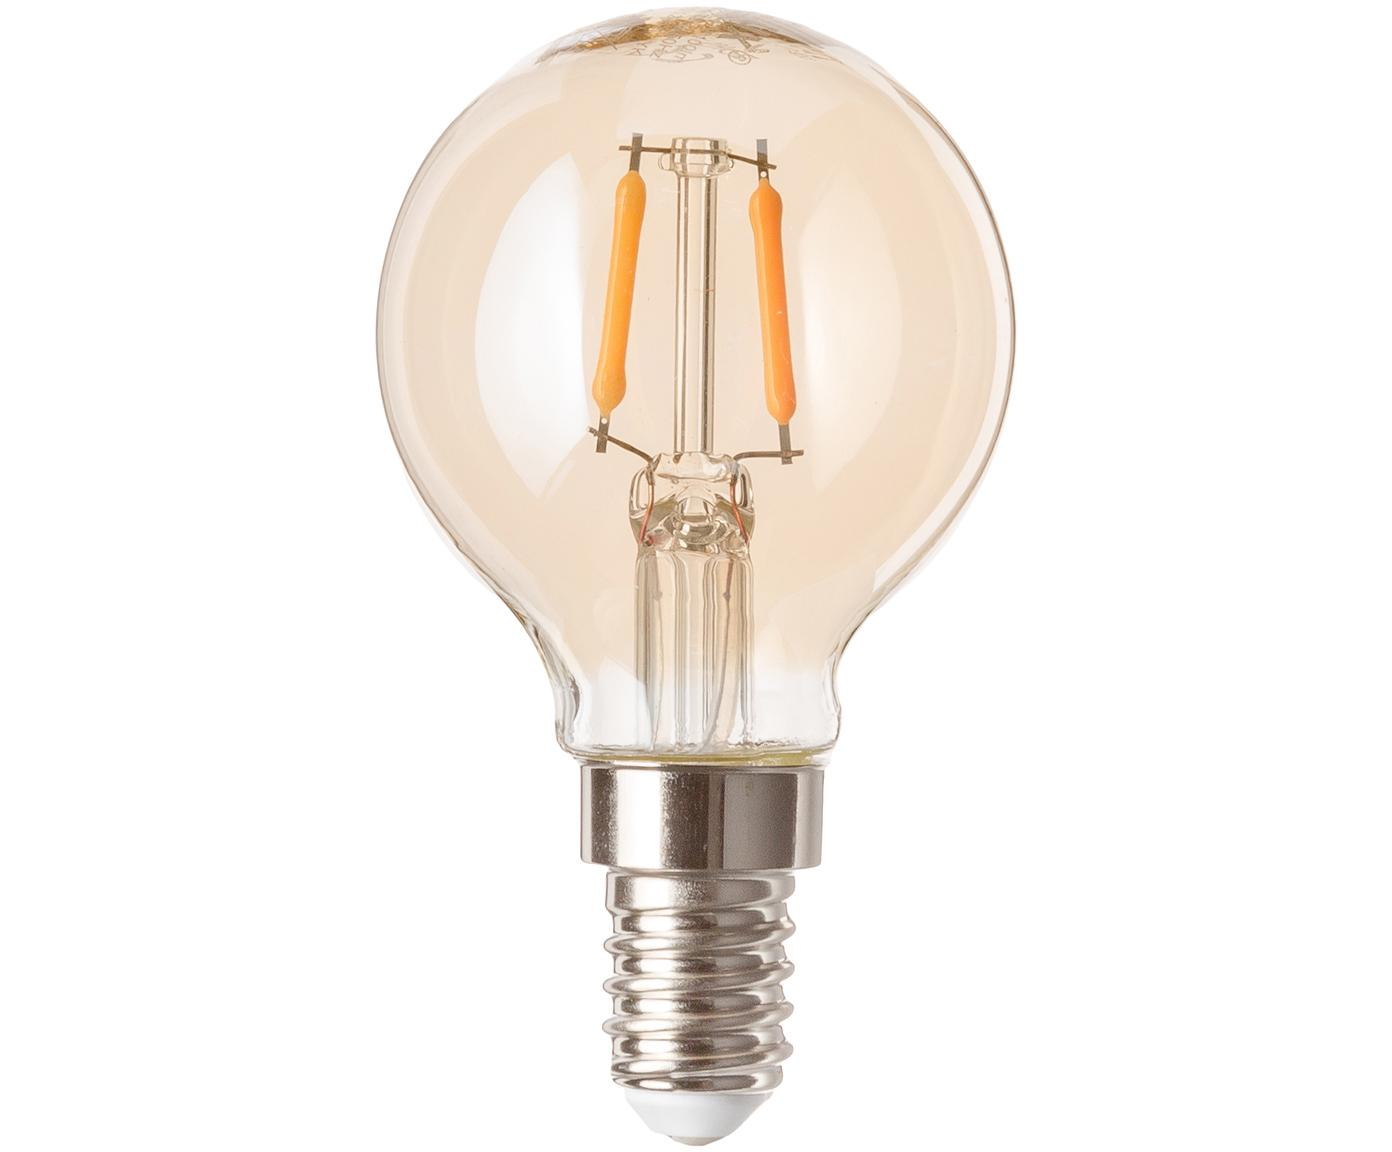 LED lamp Luel (E14 / 1W) 5 stuks, Peertje: glas, Fitting: aluminium, Amberkleurig, Ø 5 x H 8 cm